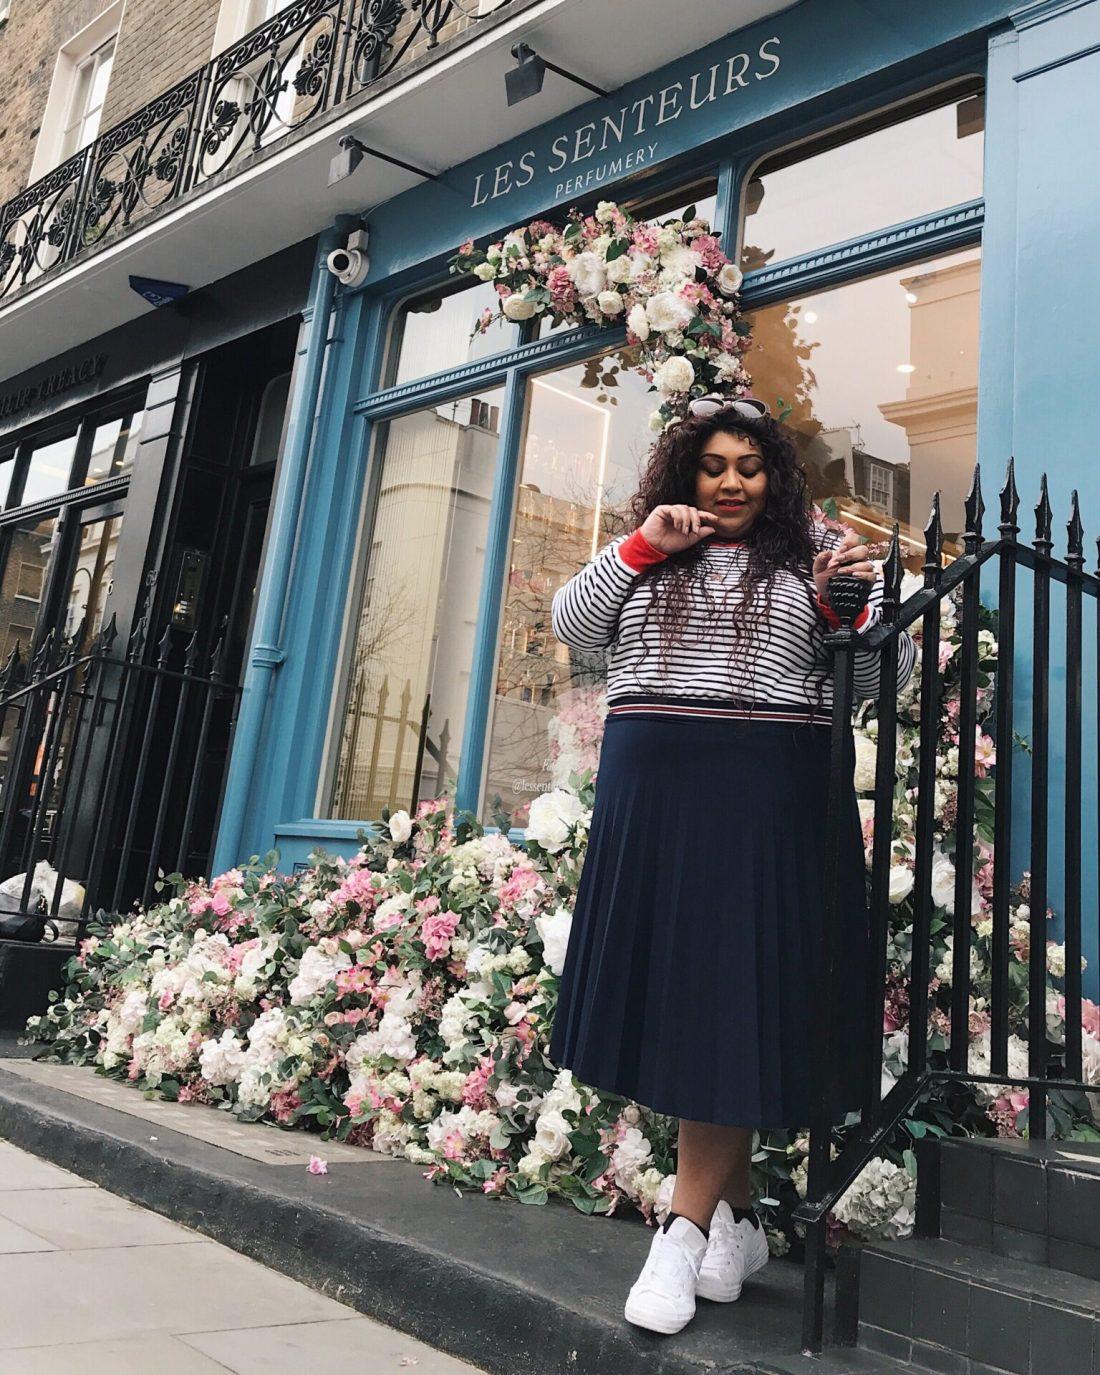 THE MOST INSTAGRAMMABLE PLACES IN BELGRAVIA LONDON, the best instagram photography spots in belgravia, nishi v, #nishitravels, moyses stevens, peggy porschen, les senteurs